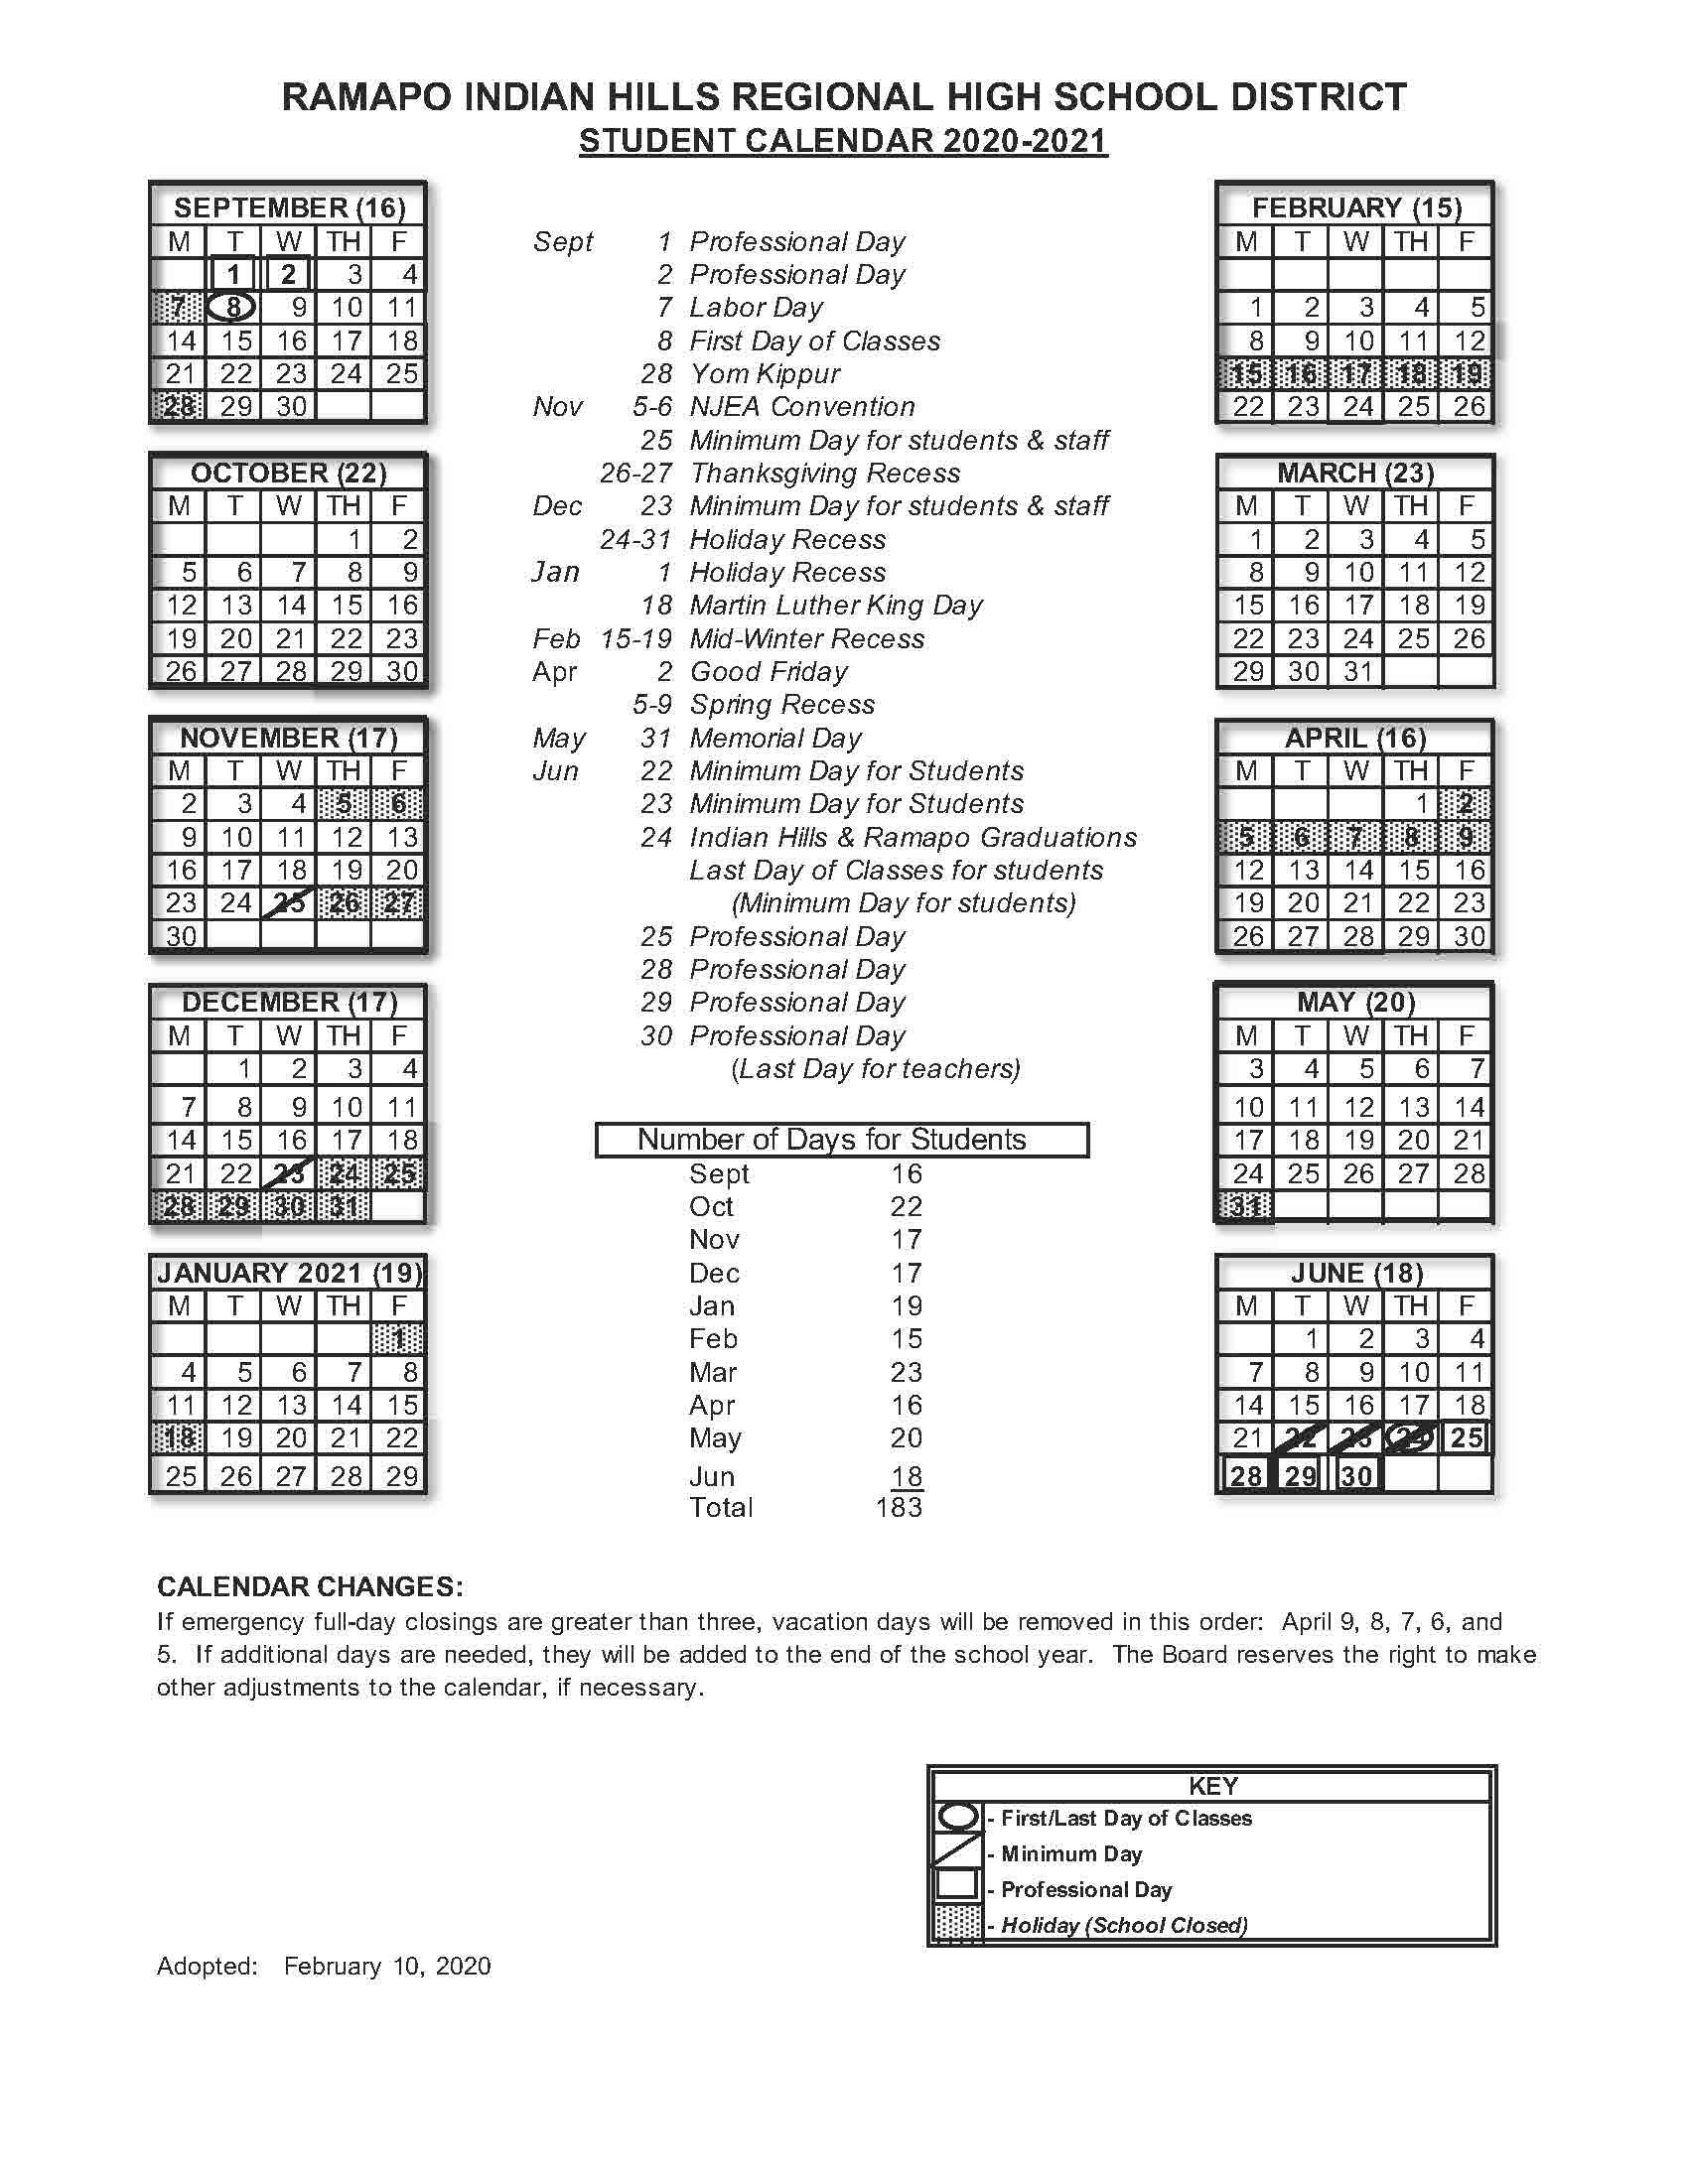 20-21 Student Calendar - Rihrhsd